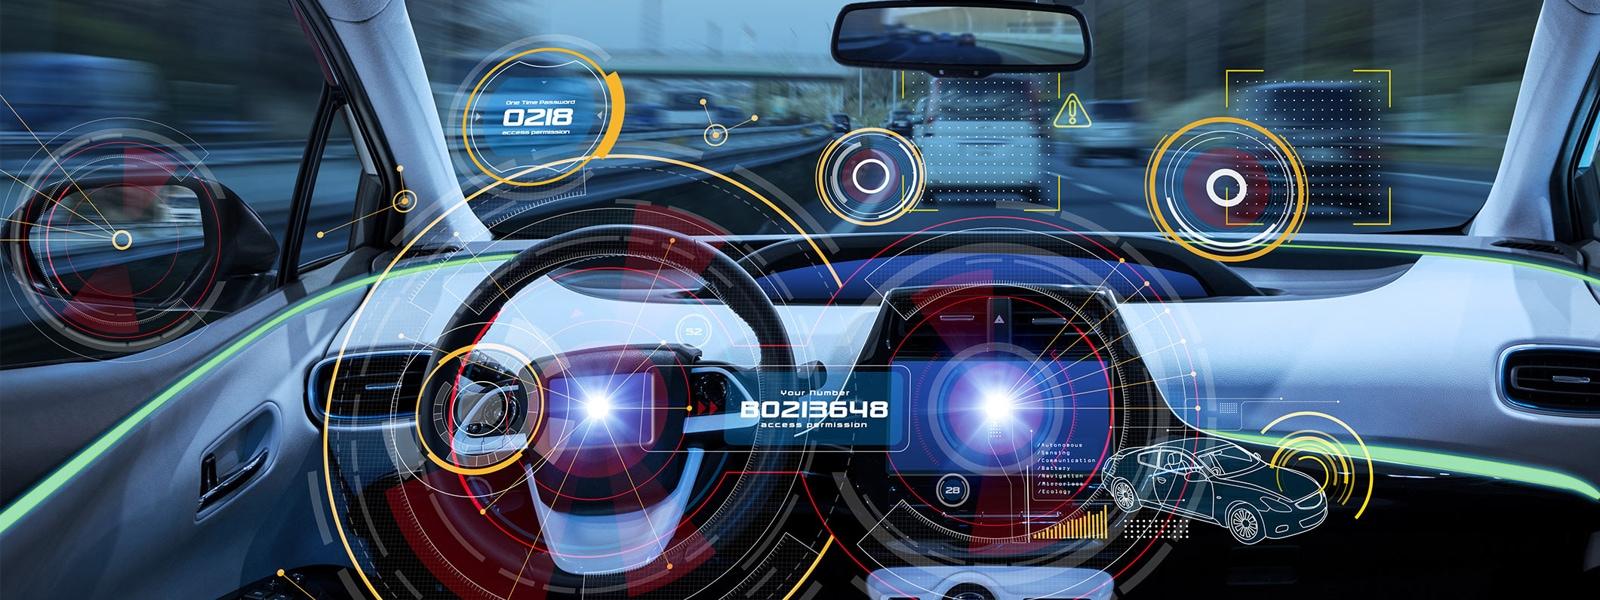 Automotive dashboard controls using modern technology